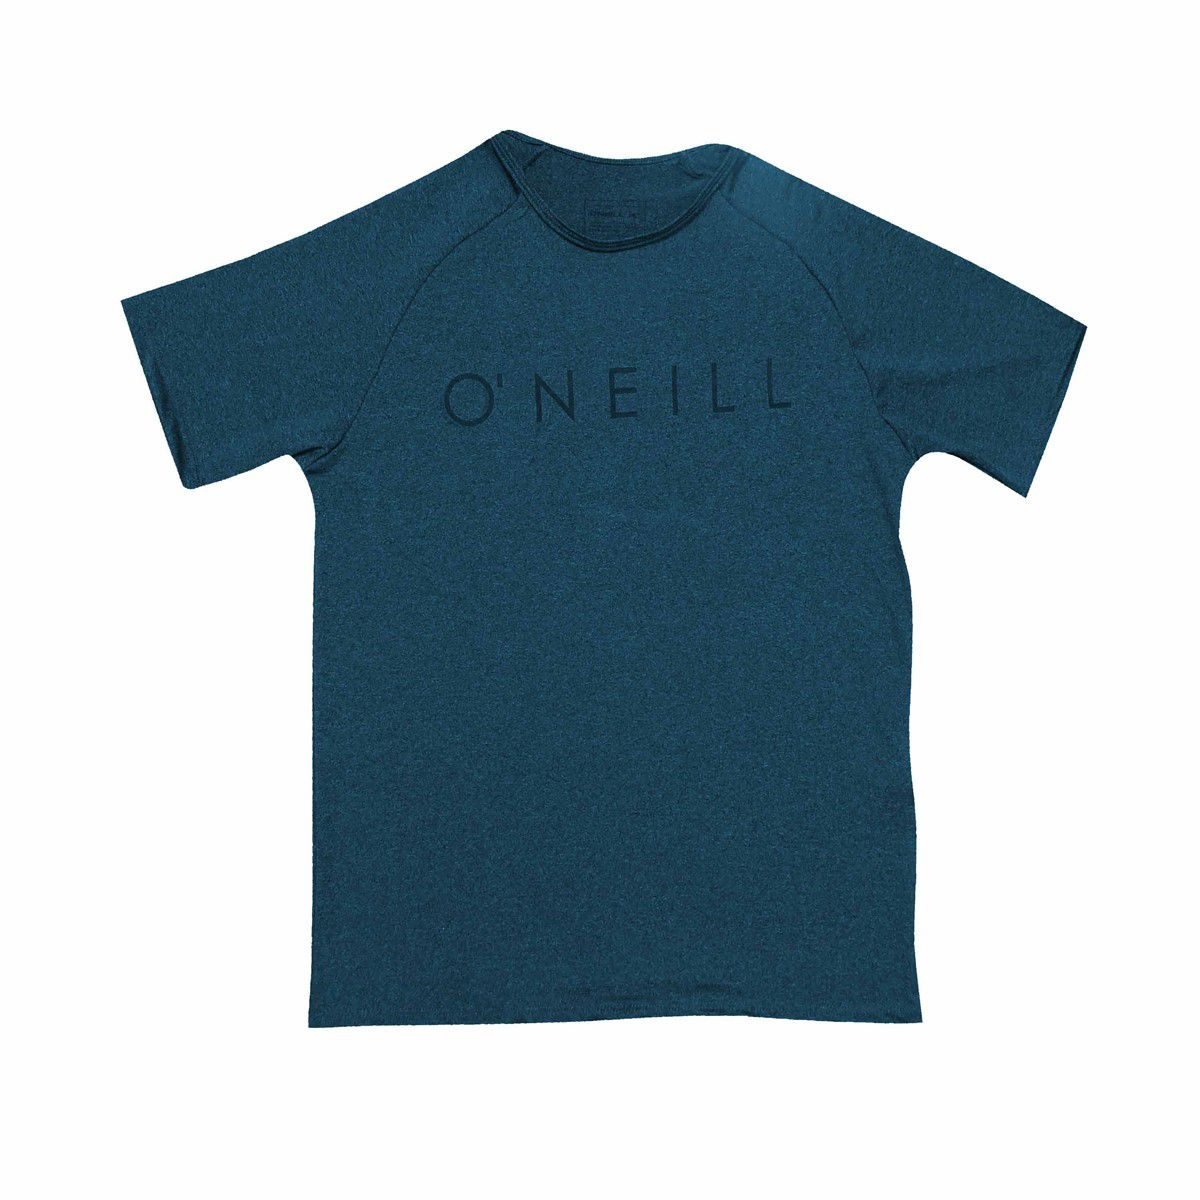 Camiseta O'neill Raglan Hibrida Blue